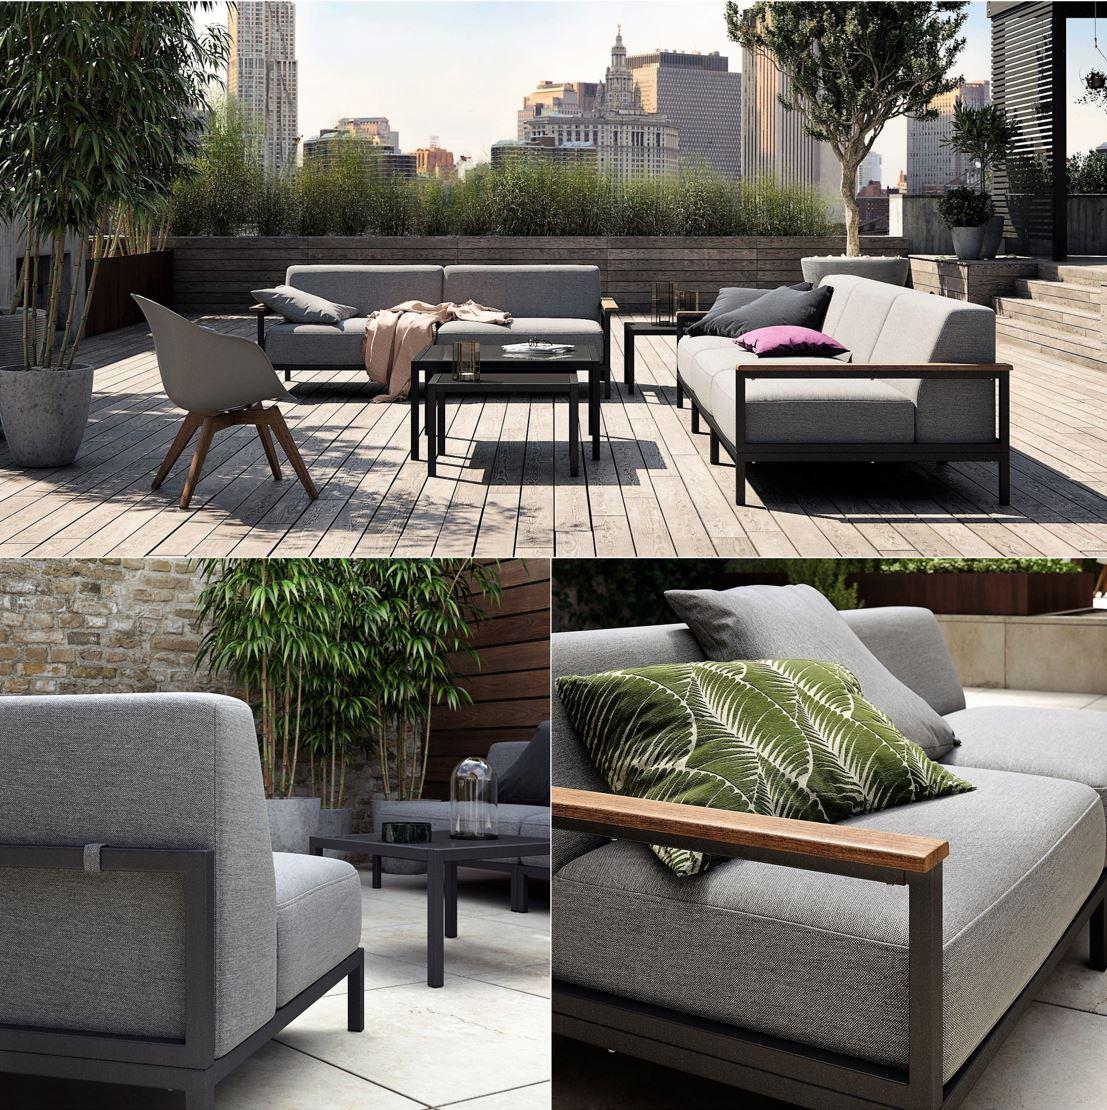 outdoor m bel boconcept experience hamburg am fischmarkt. Black Bedroom Furniture Sets. Home Design Ideas